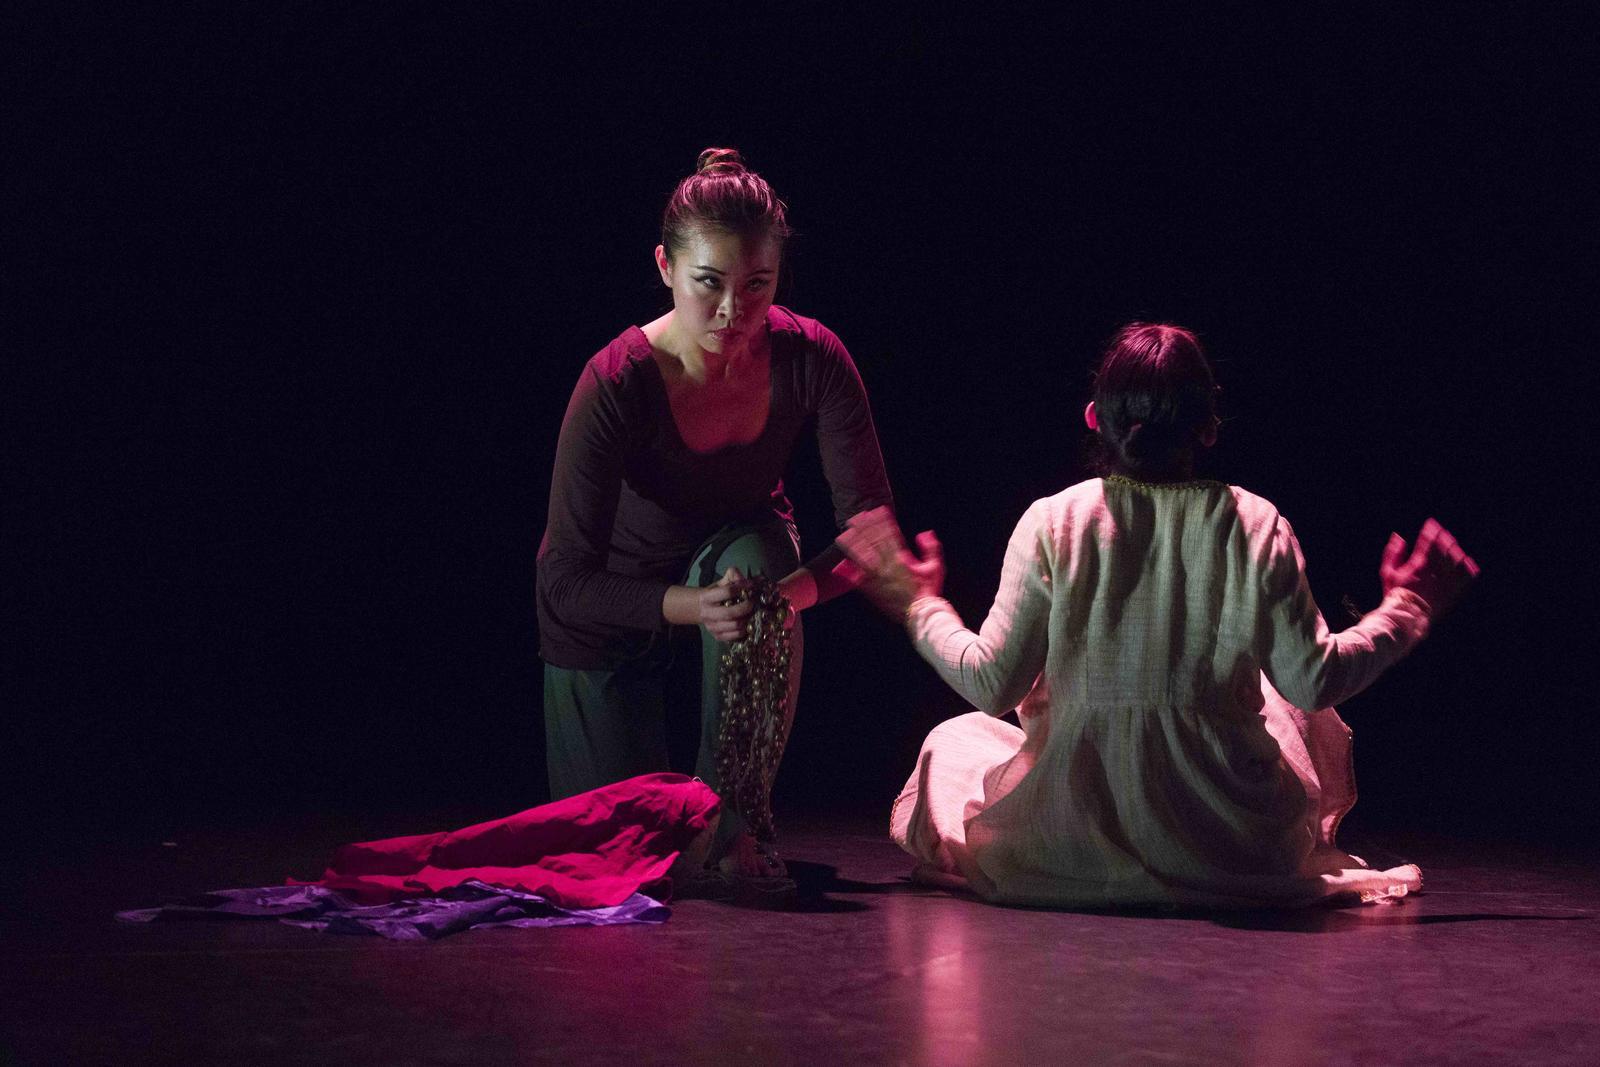 ©Amina Khayyam Dance Company